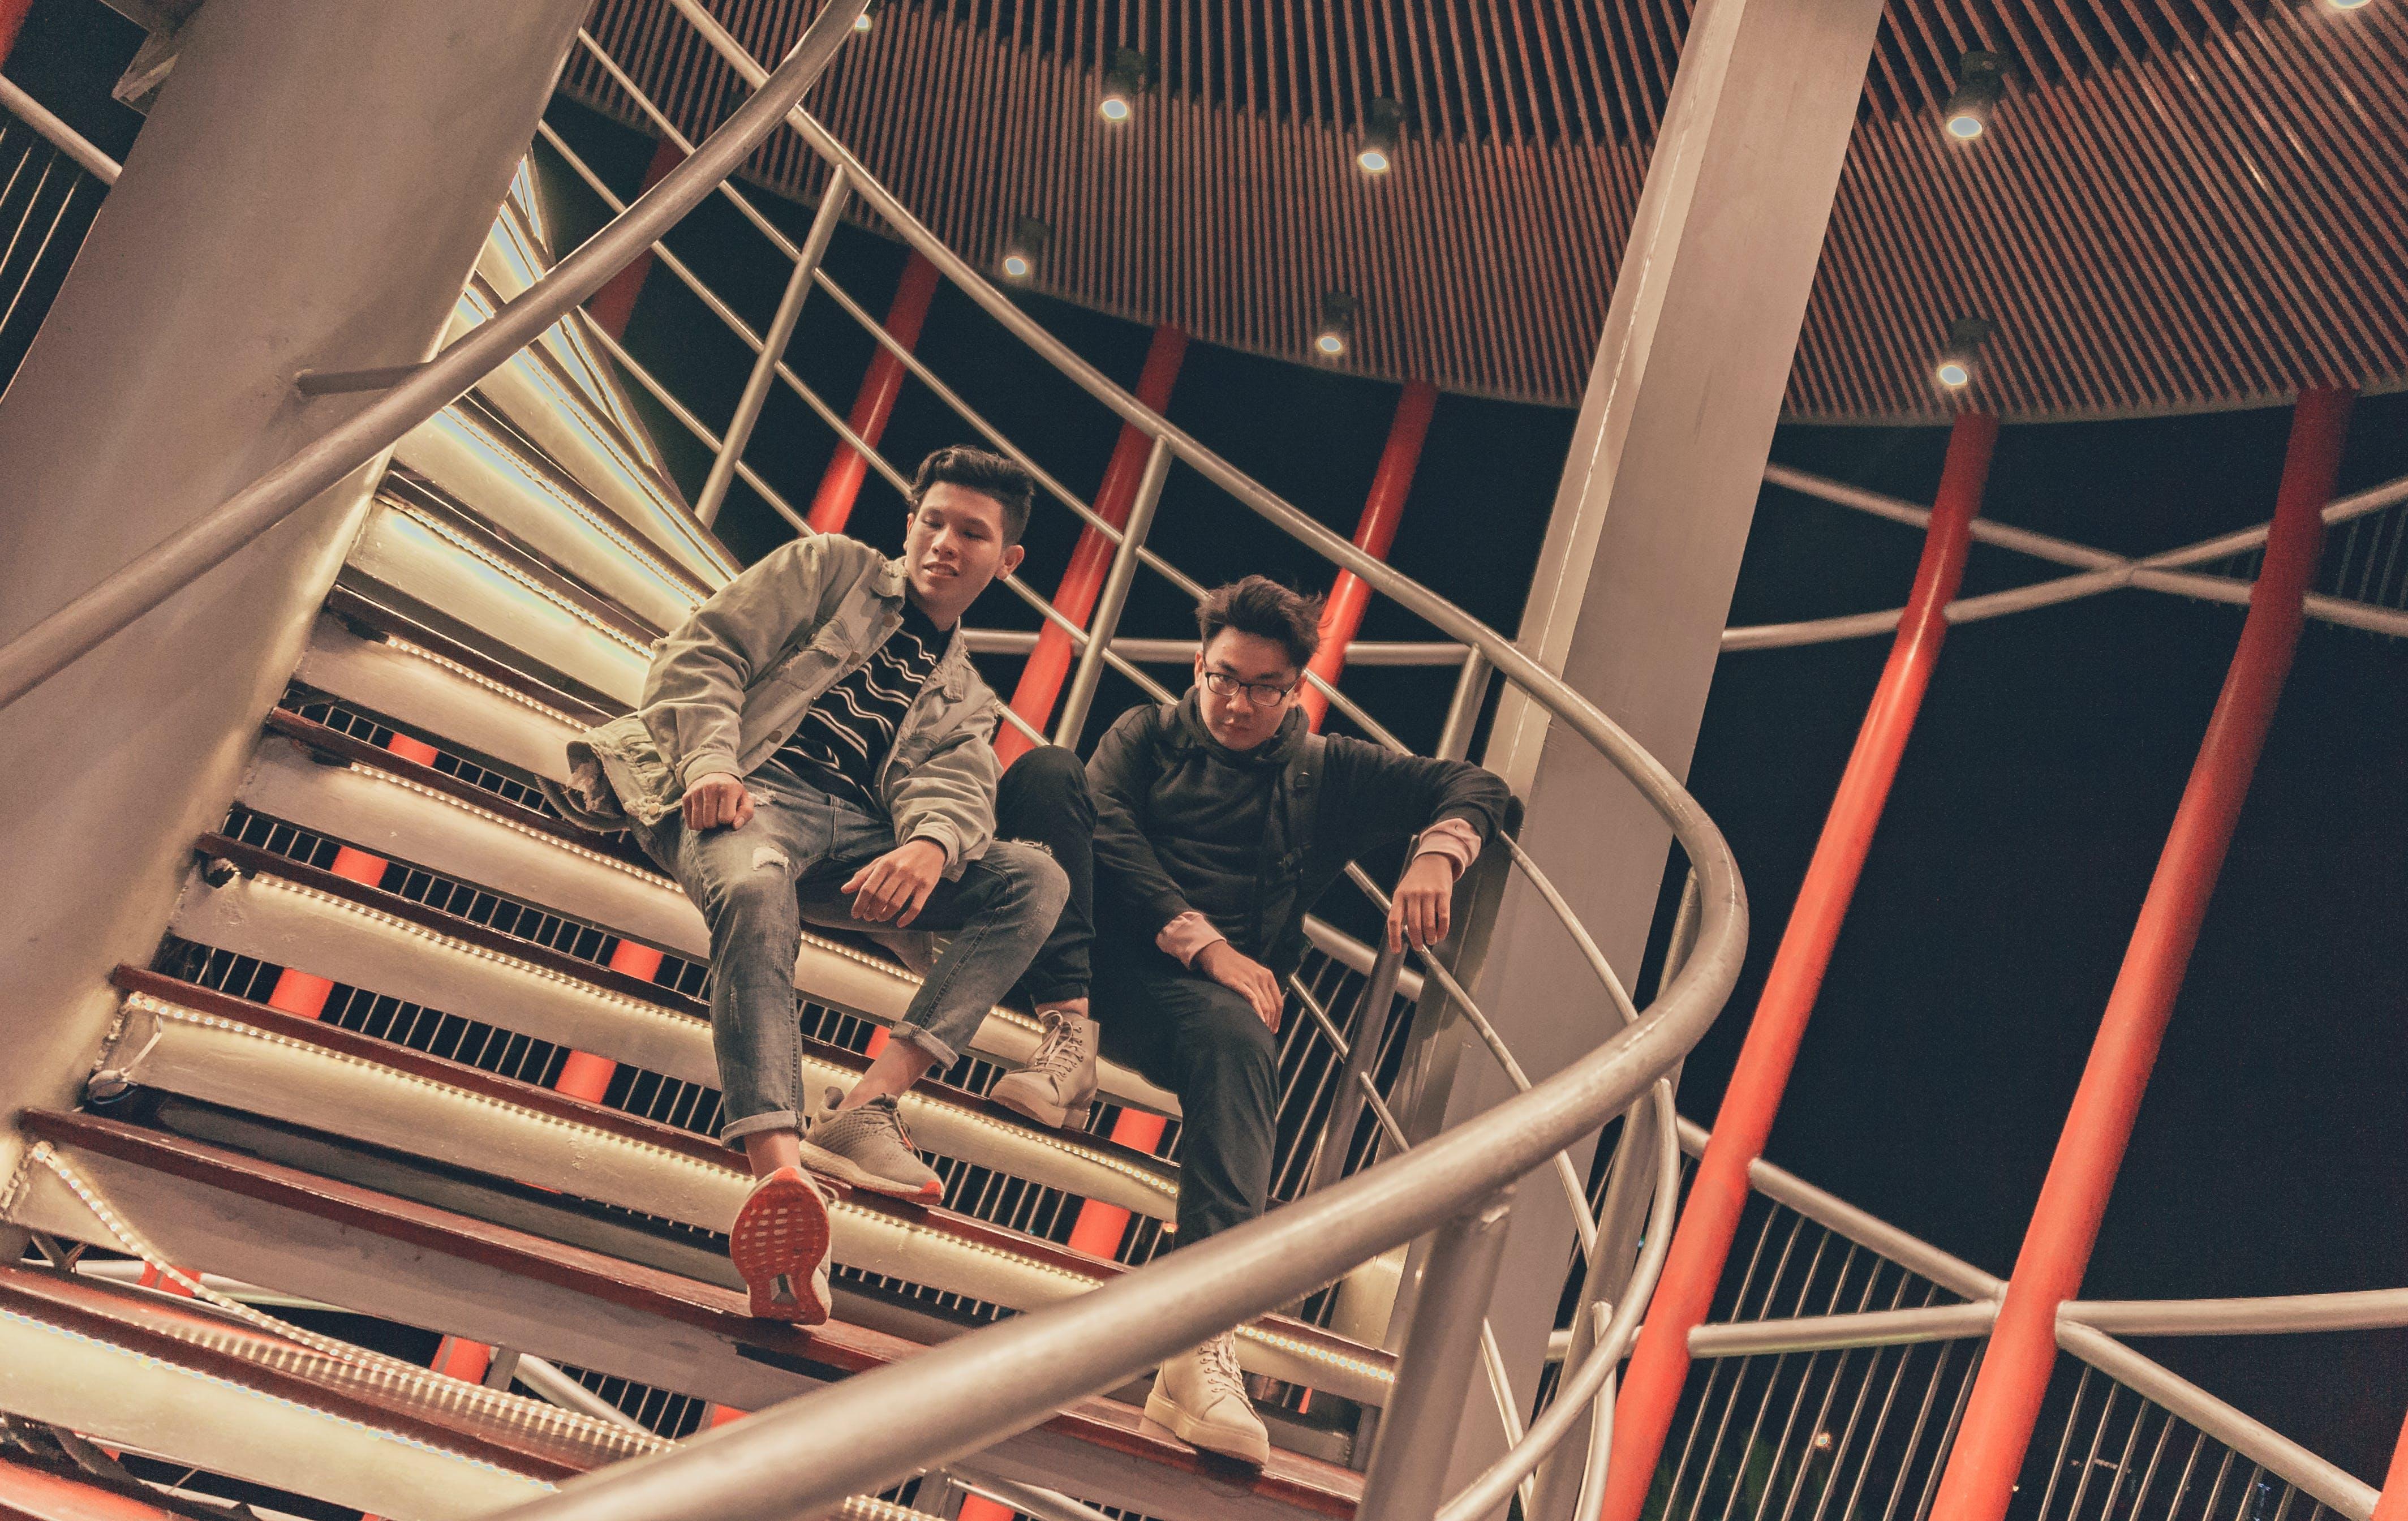 Two Men Sitting on Spiral Stairway